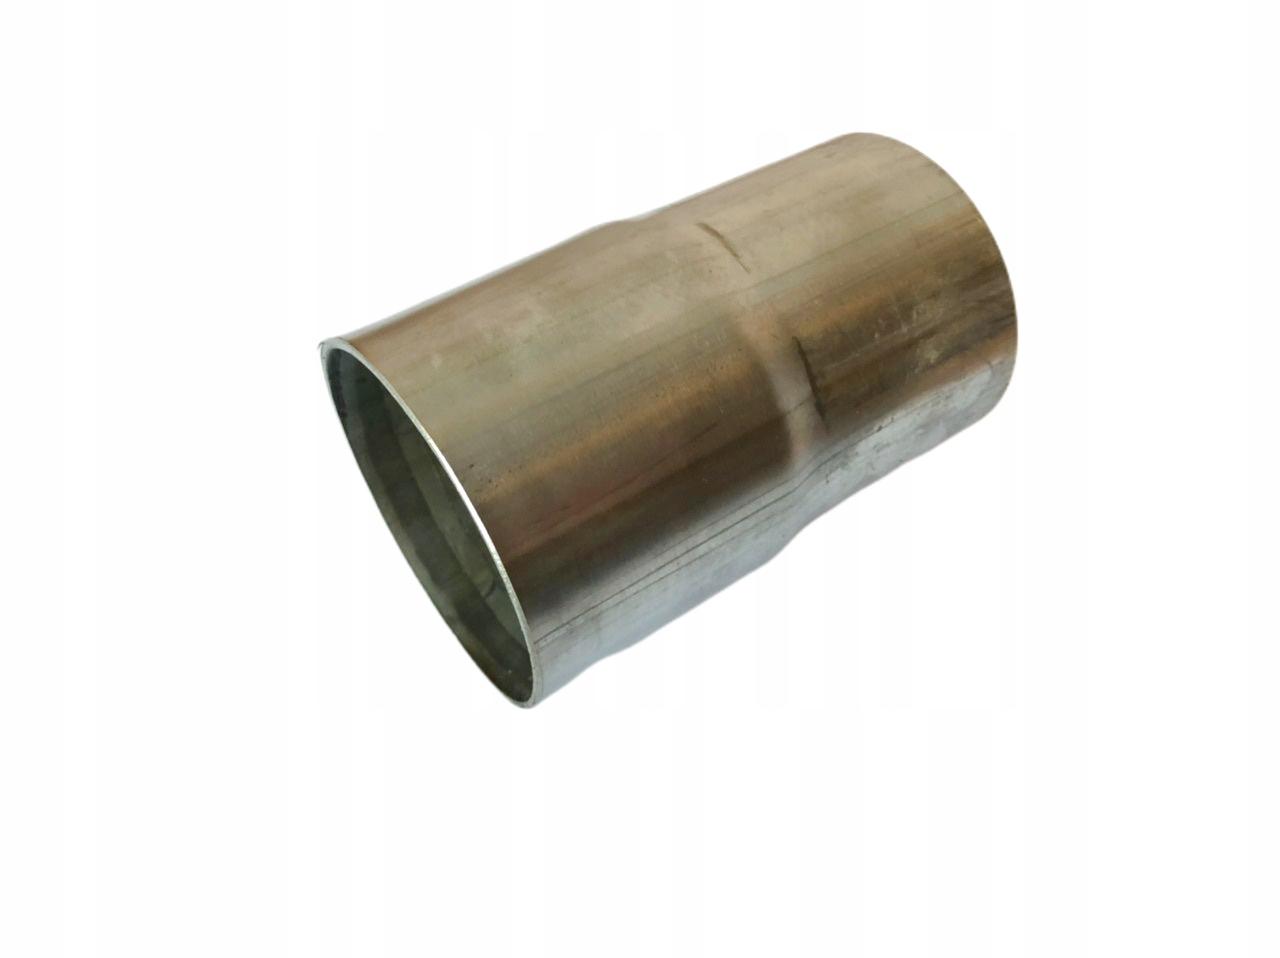 уменьшение заколка roztłoczenie сталь 515457